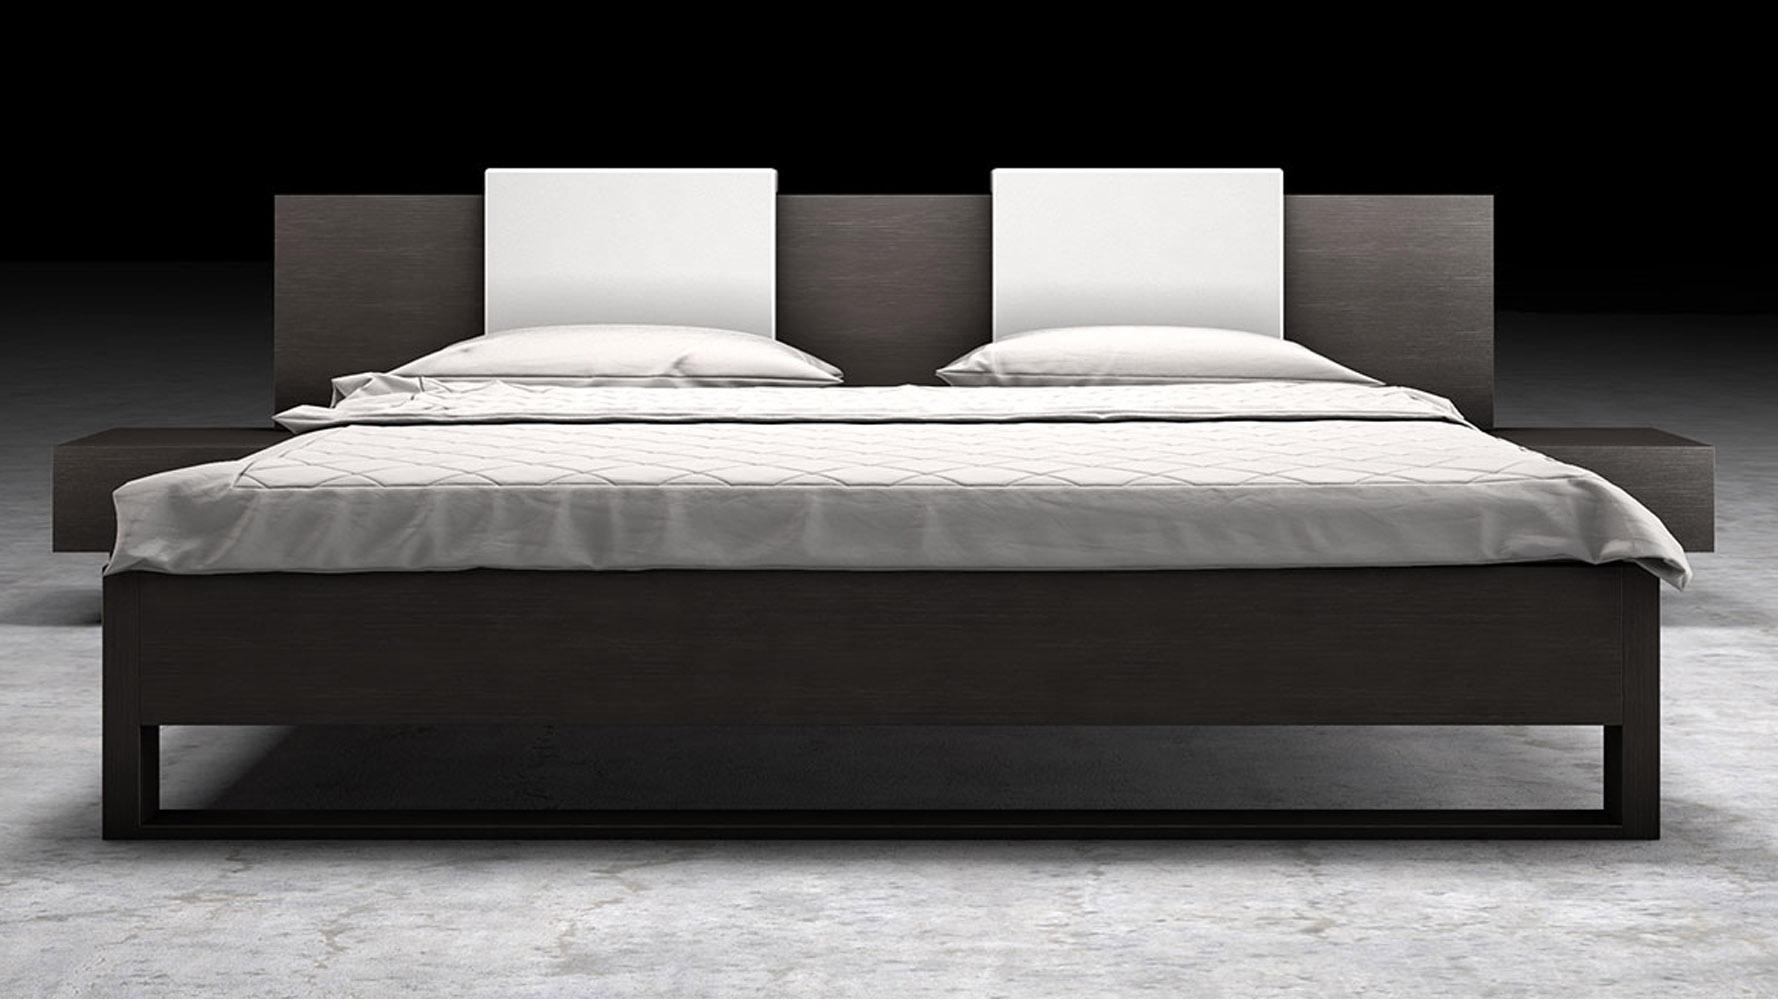 Wooden furniture box beds - Wooden Furniture Box Beds 30